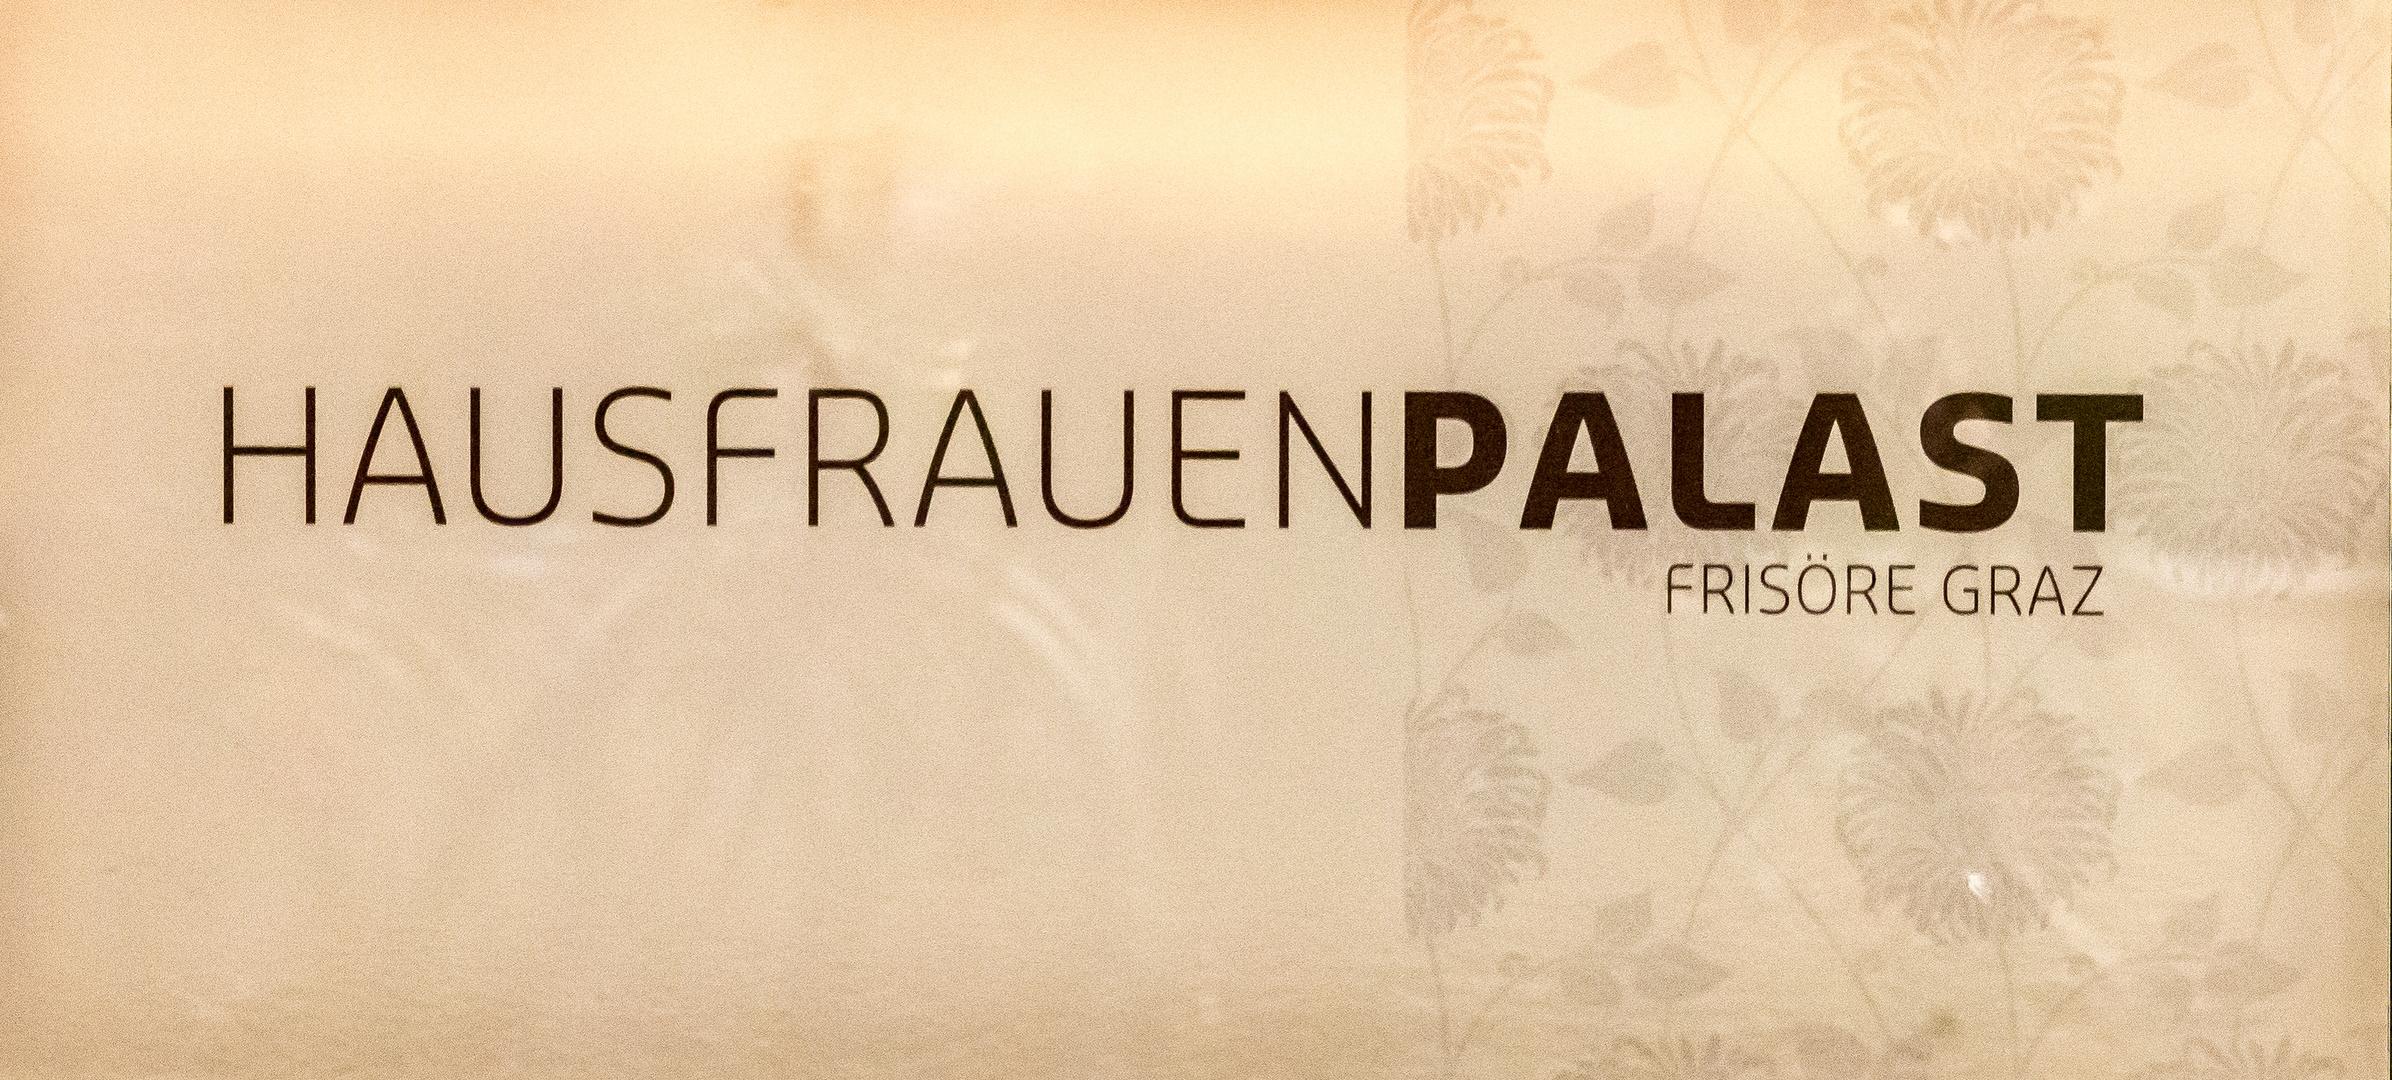 Hausfrauenpalast Graz